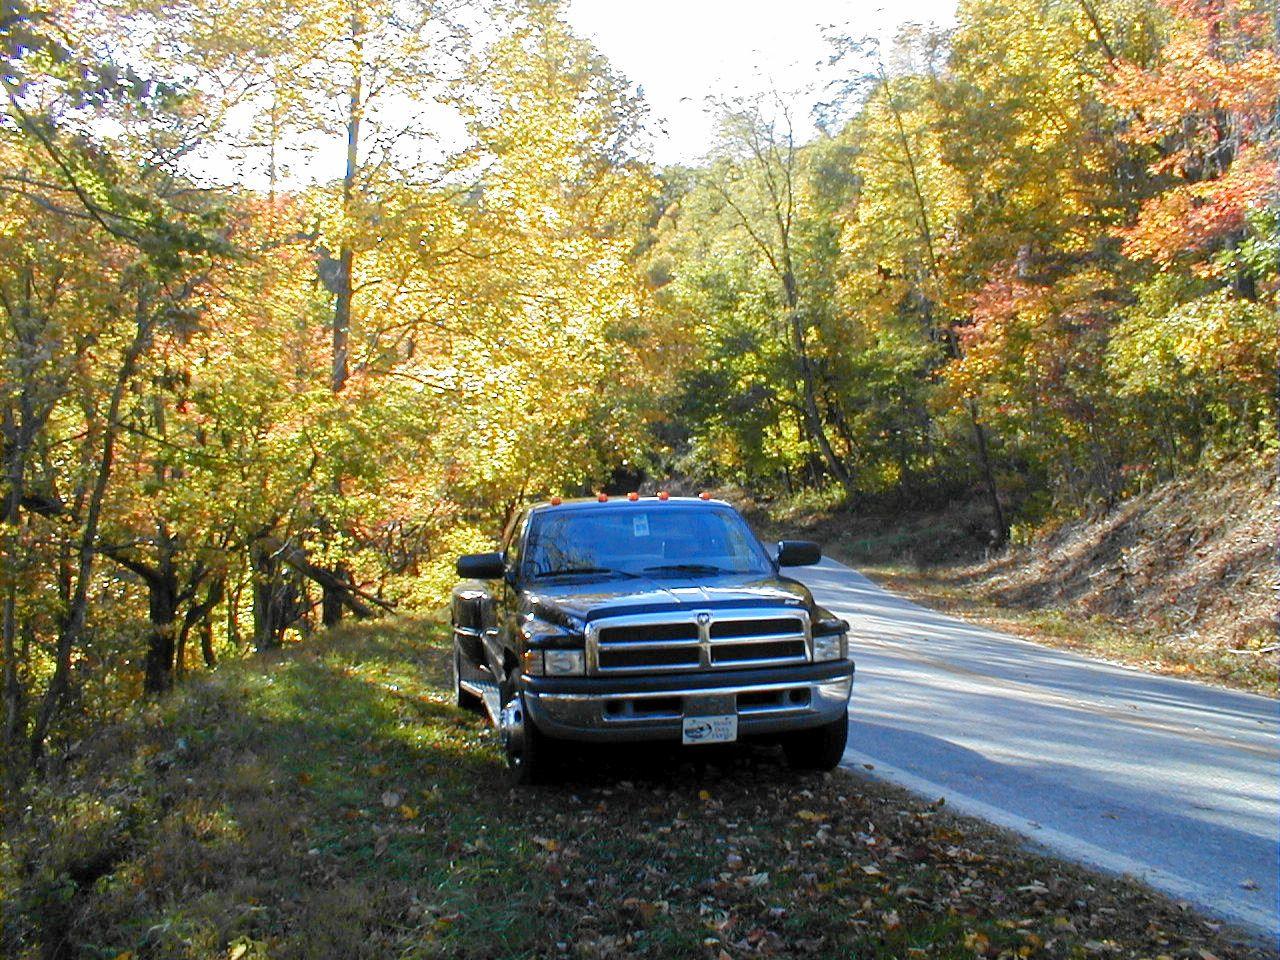 Fall colors in the mountains near Ashville, North Carolina. ~~ 10/23/99